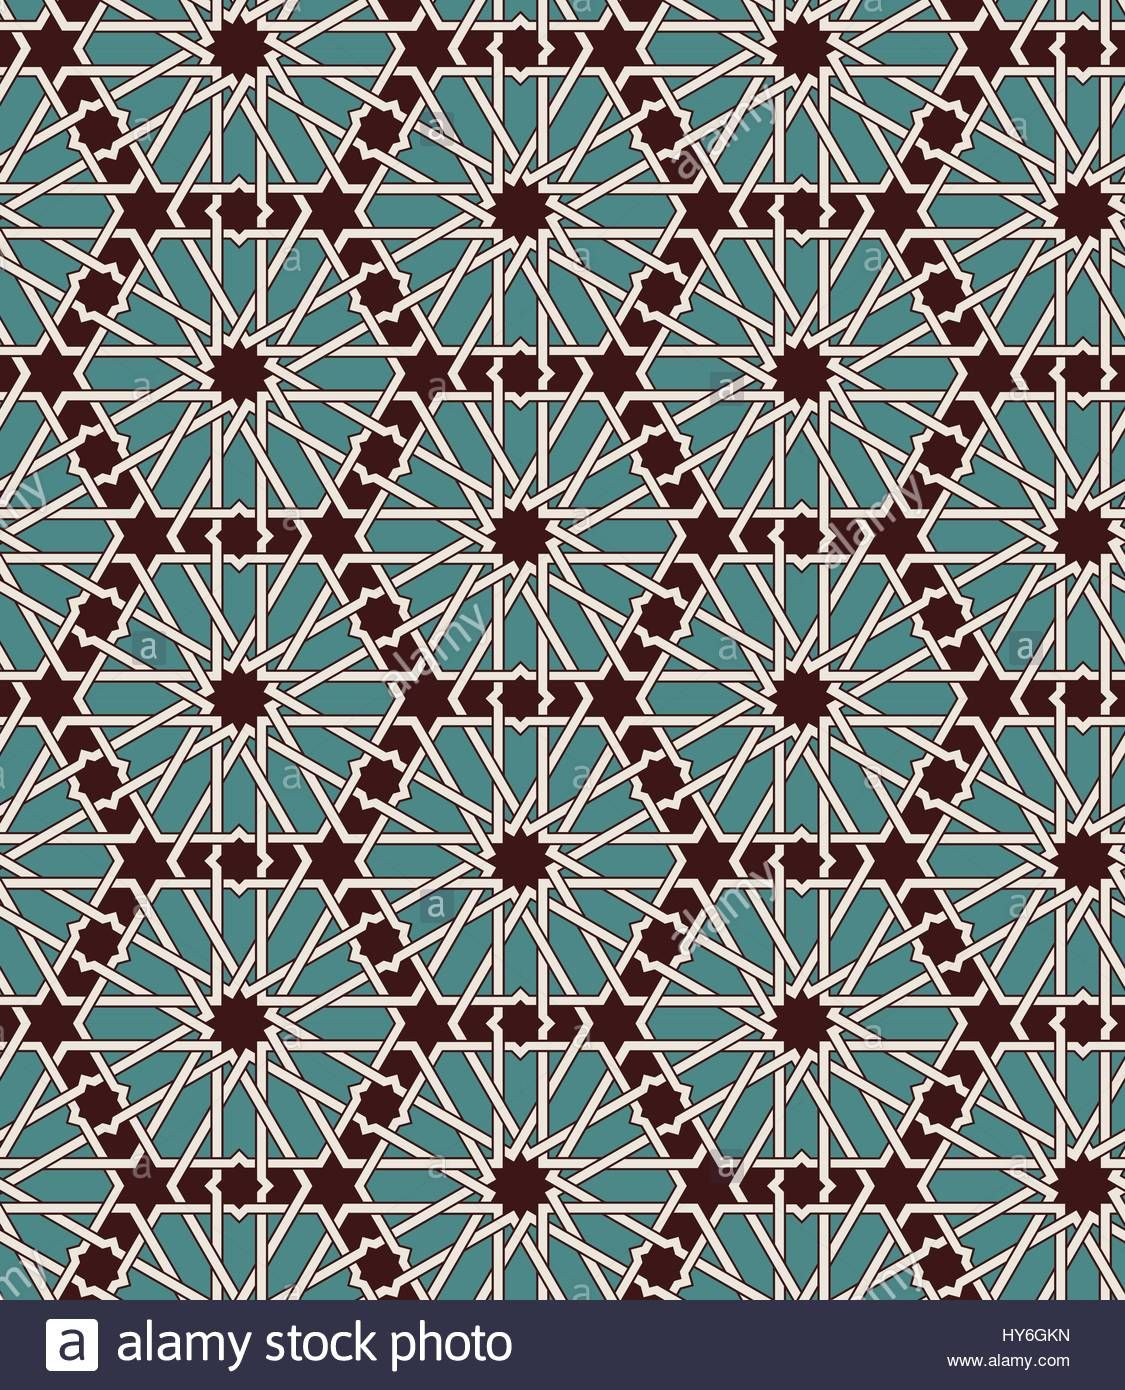 seamless islamic moroccan pattern arabic geometric ornament muslim texture vintage repeating background